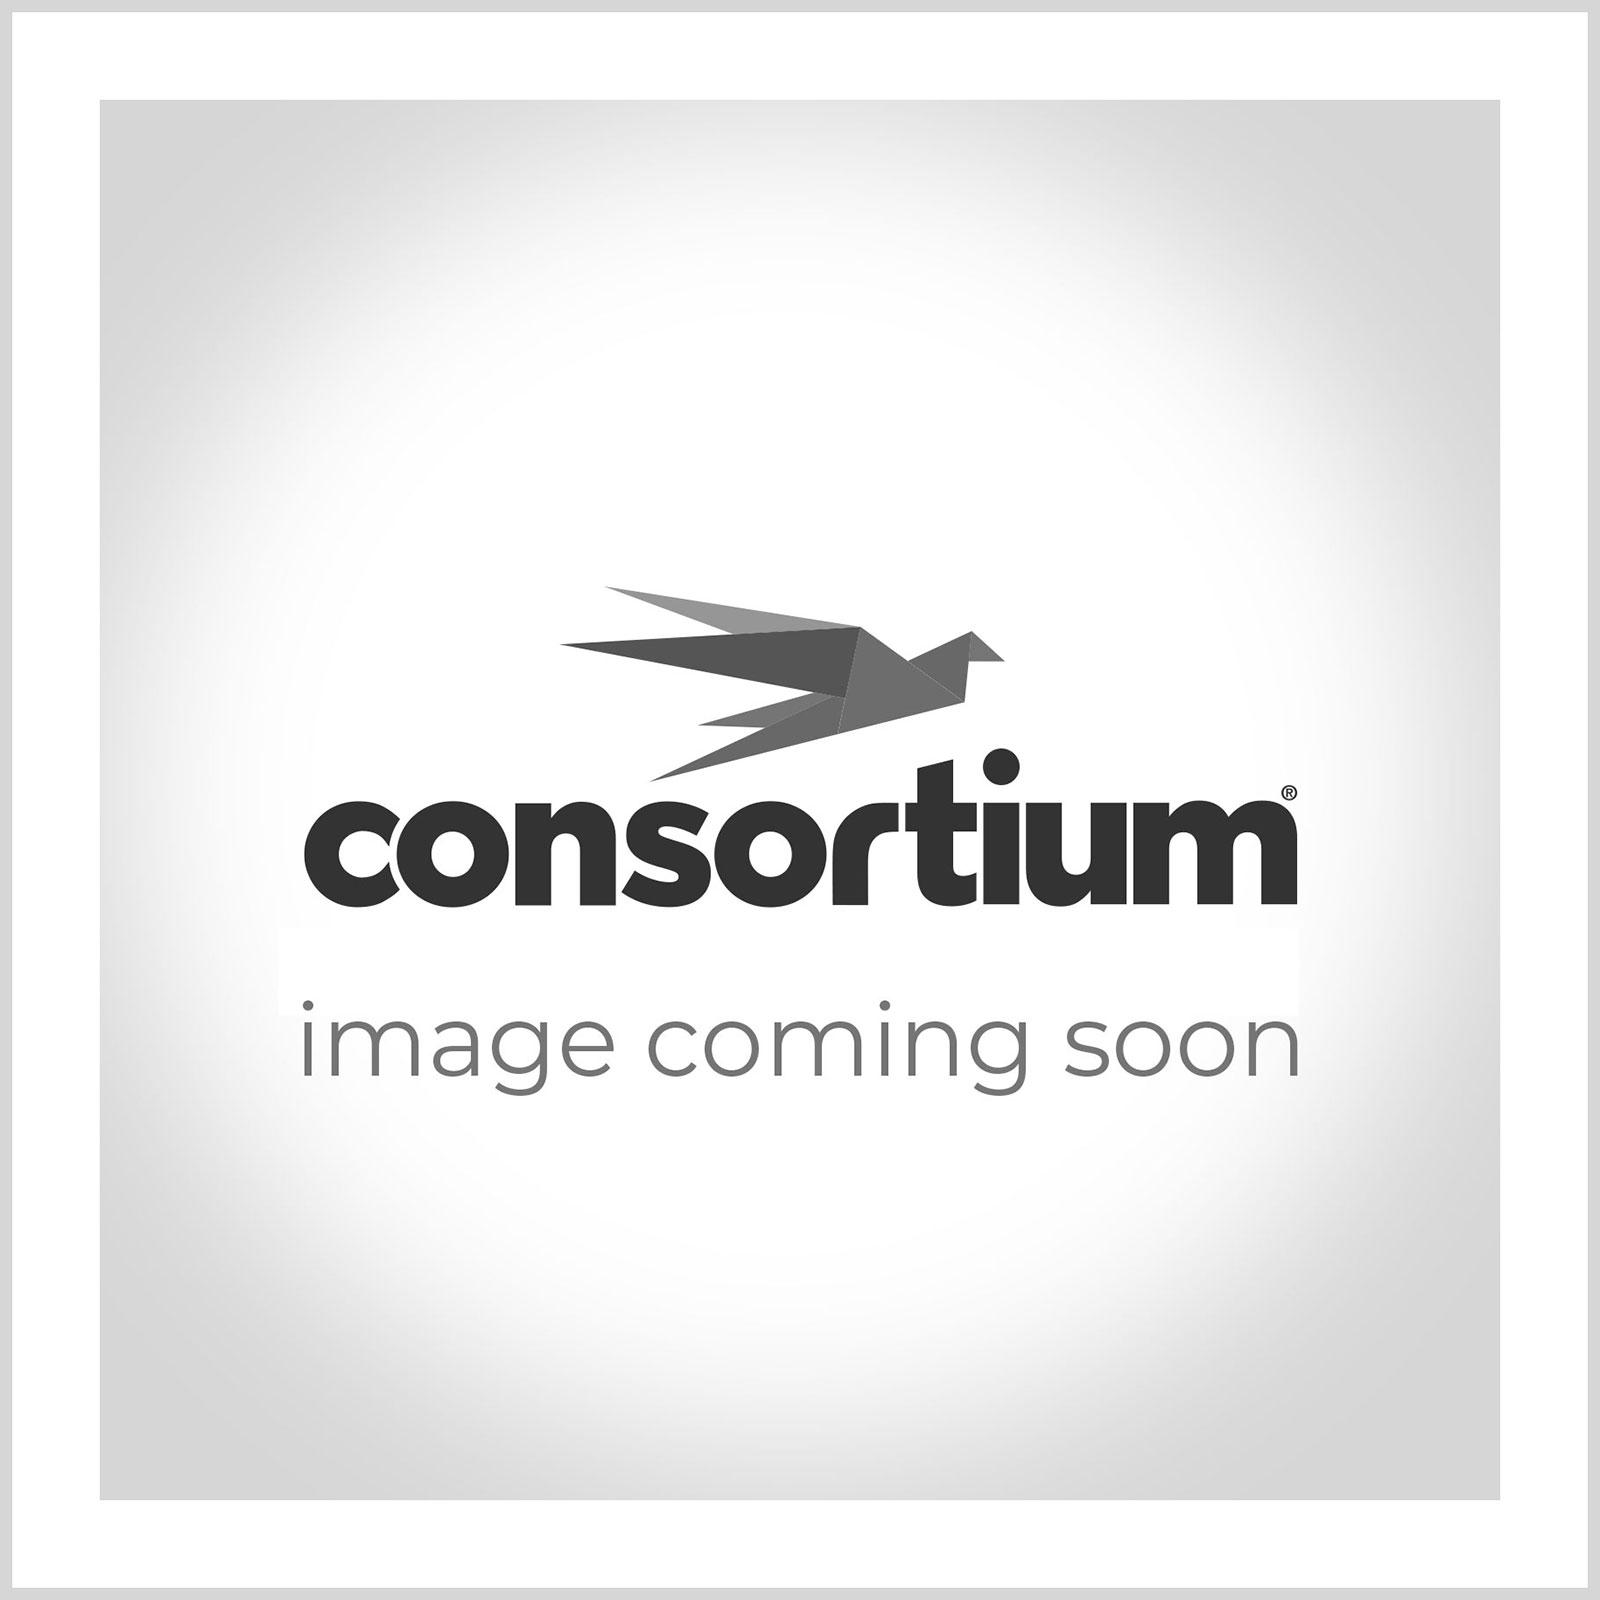 Handheld 8 Digit Calculator